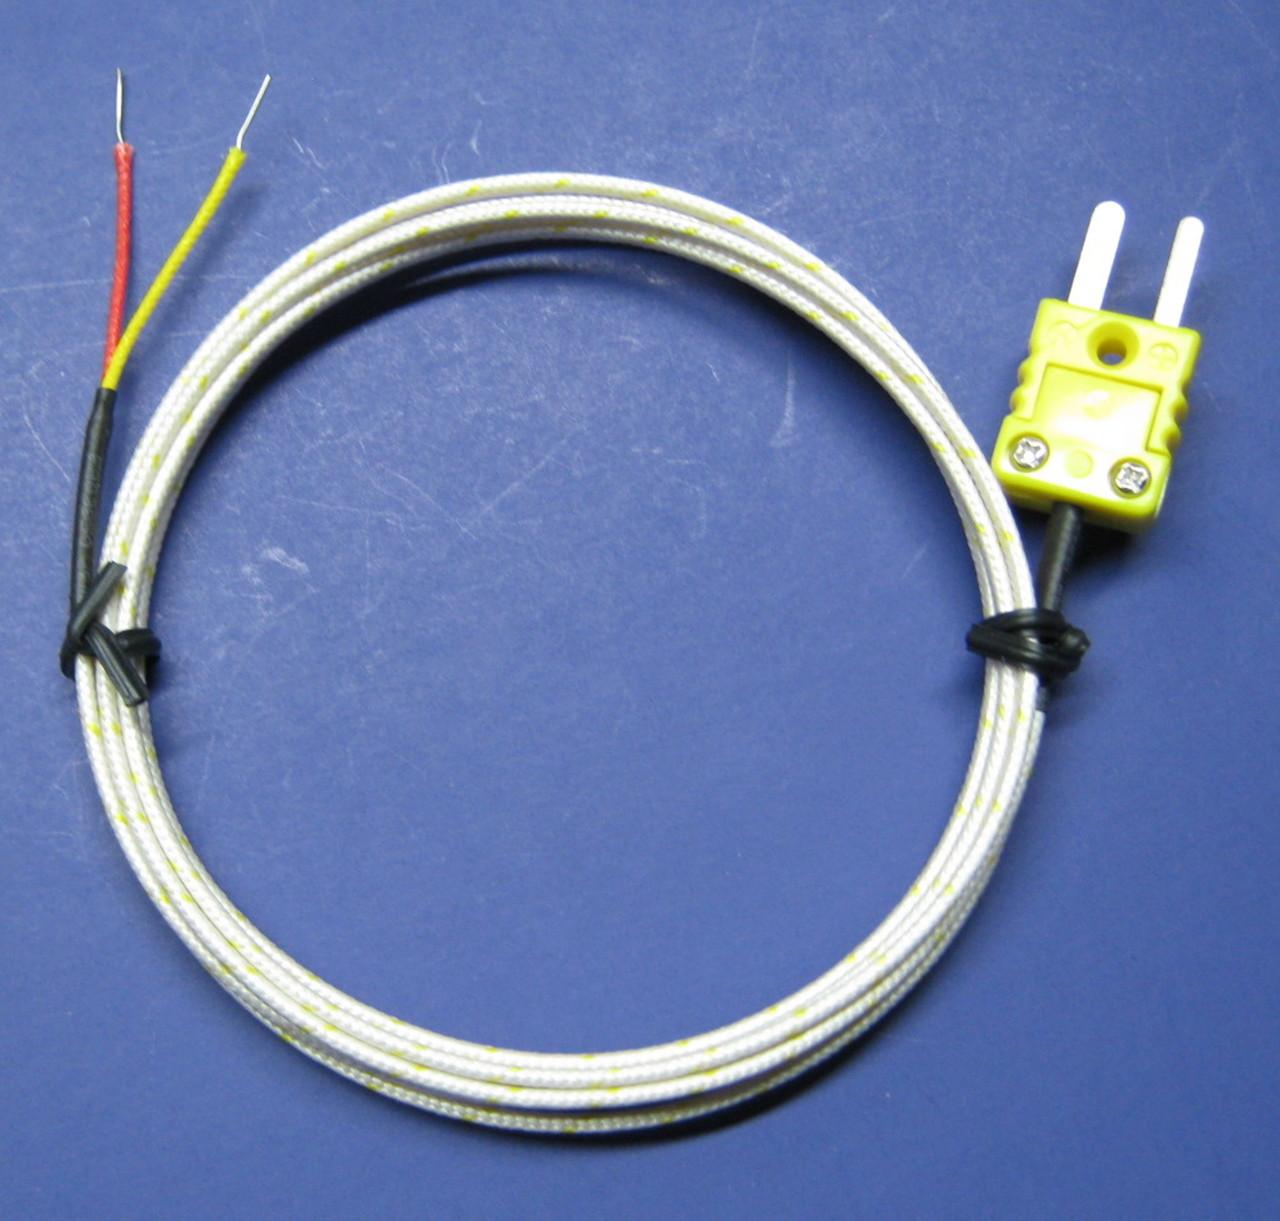 type k thermocouple hookup